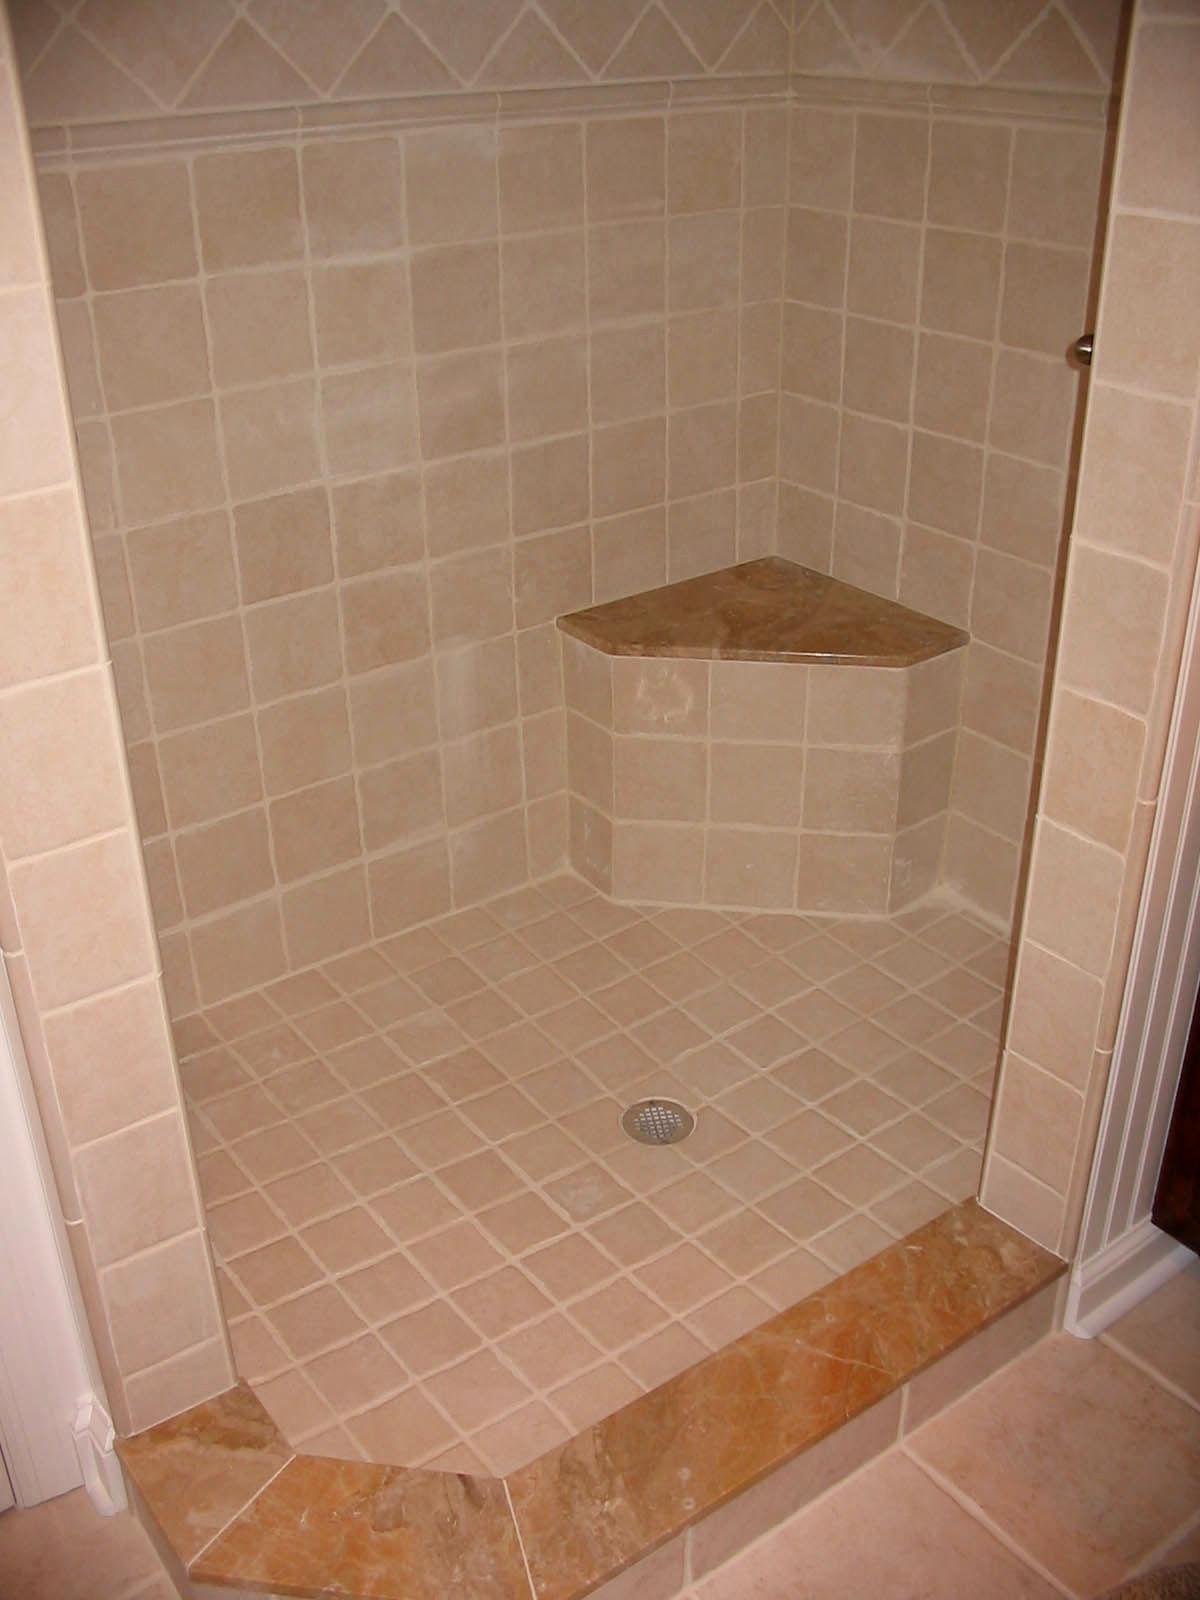 wonderful tile flooring for bathroom ideas-Contemporary Tile Flooring for Bathroom Plan